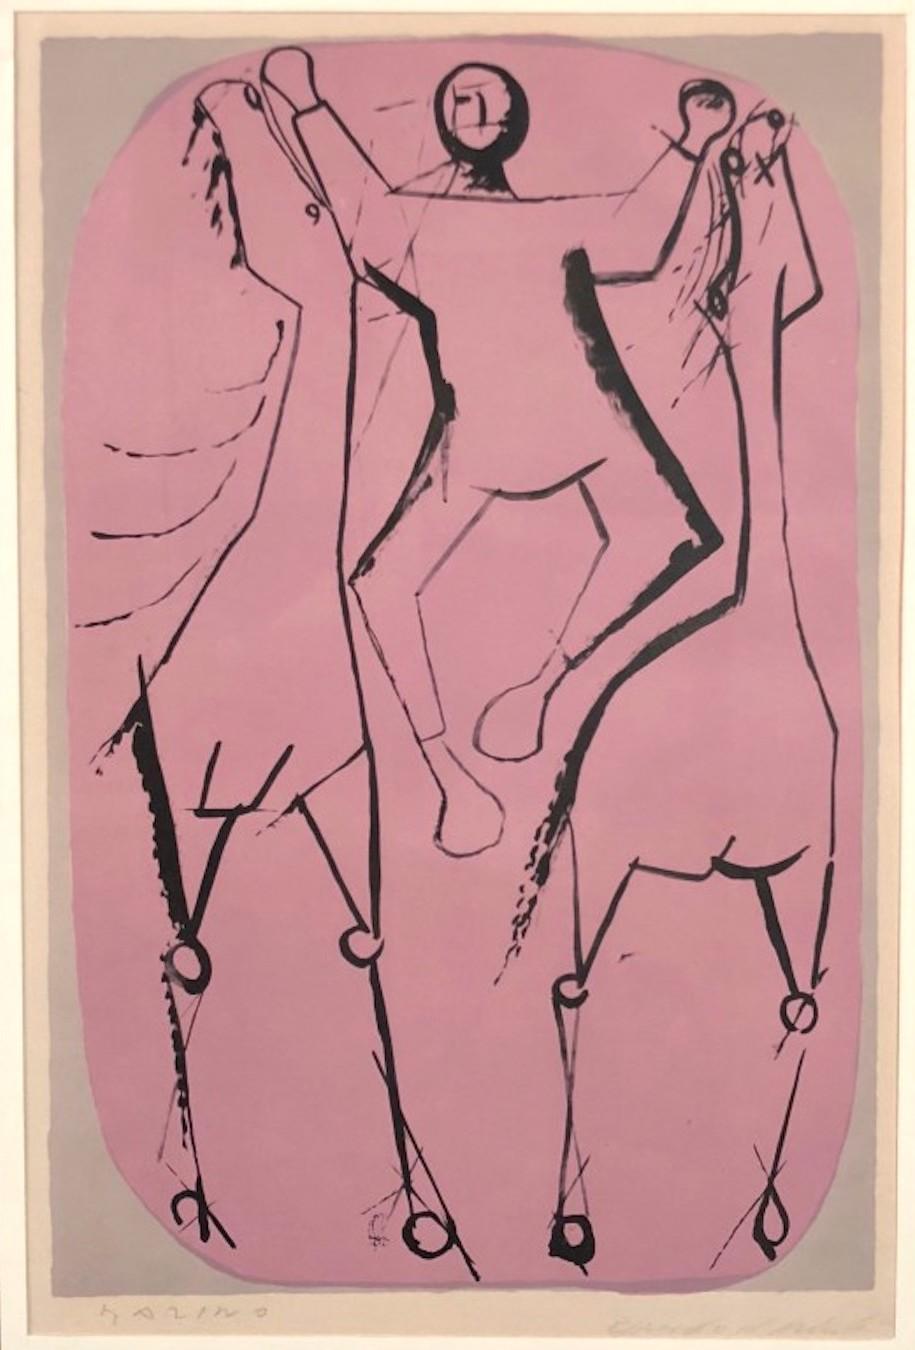 Jugglers - Chevaux et Jongleur - Original Lithograph by Marino Marini - 1951